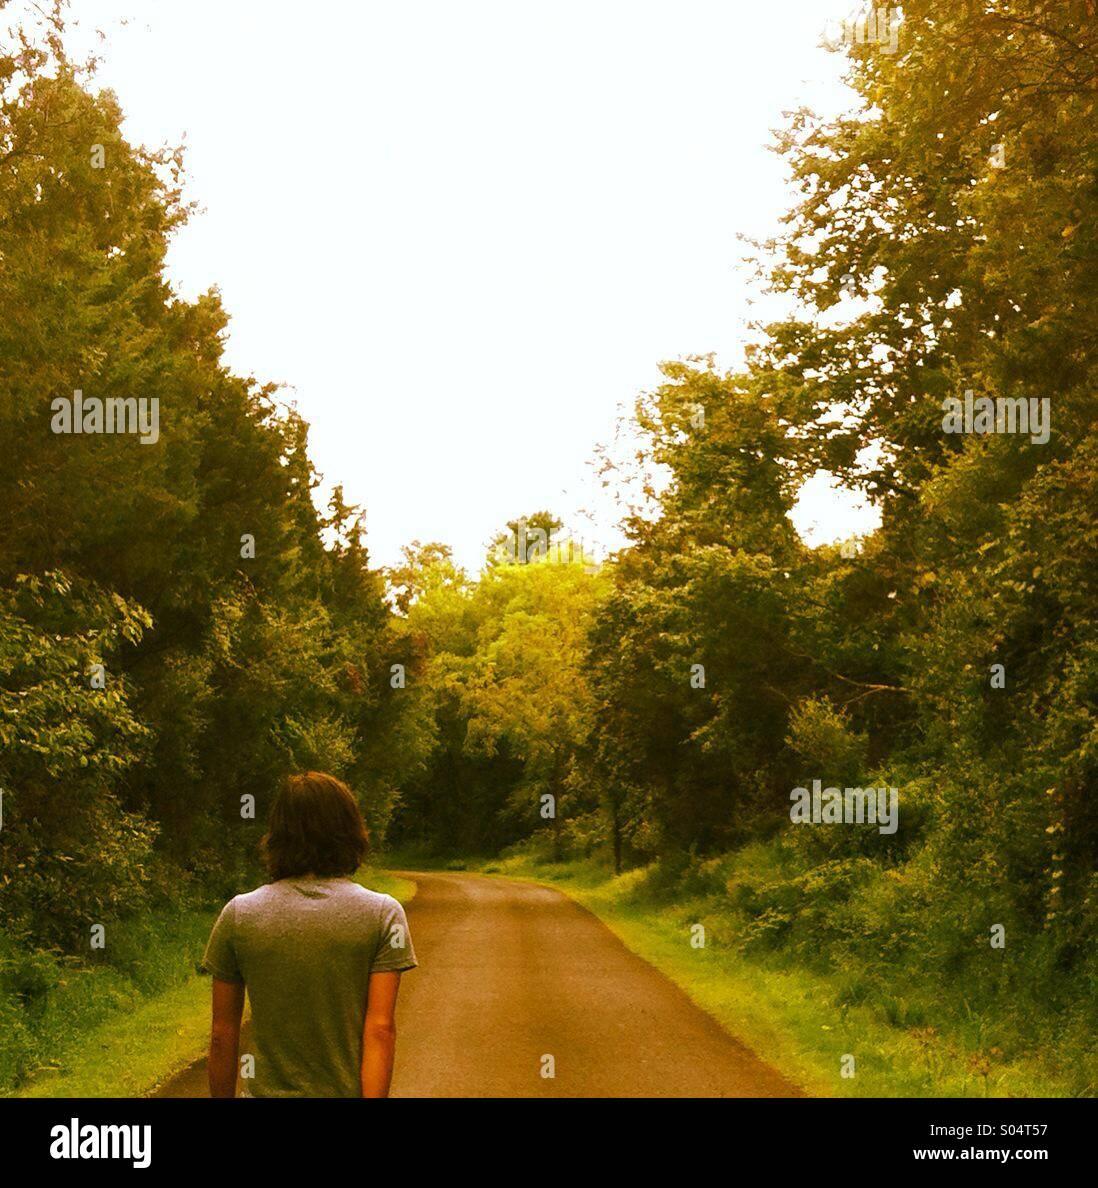 Un joven camina por una calle estrecha, rodeada de árboles. Imagen De Stock